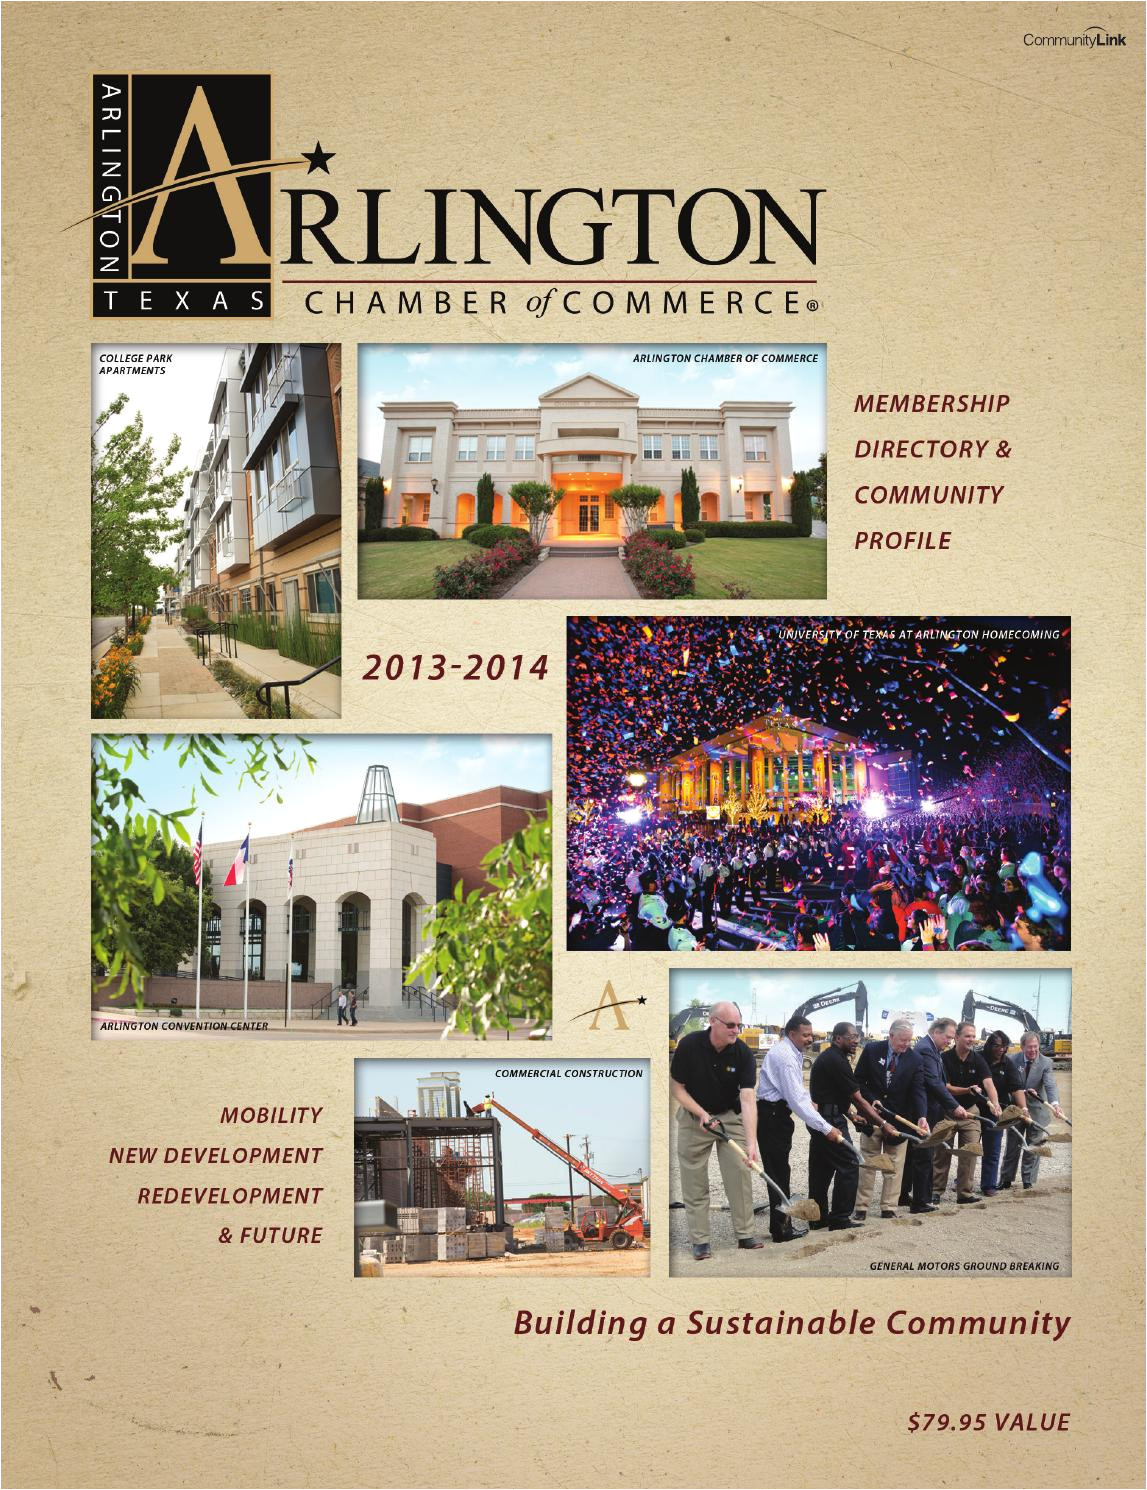 arlington tx 2013 membership directory and community profile by tivoli design media group issuu